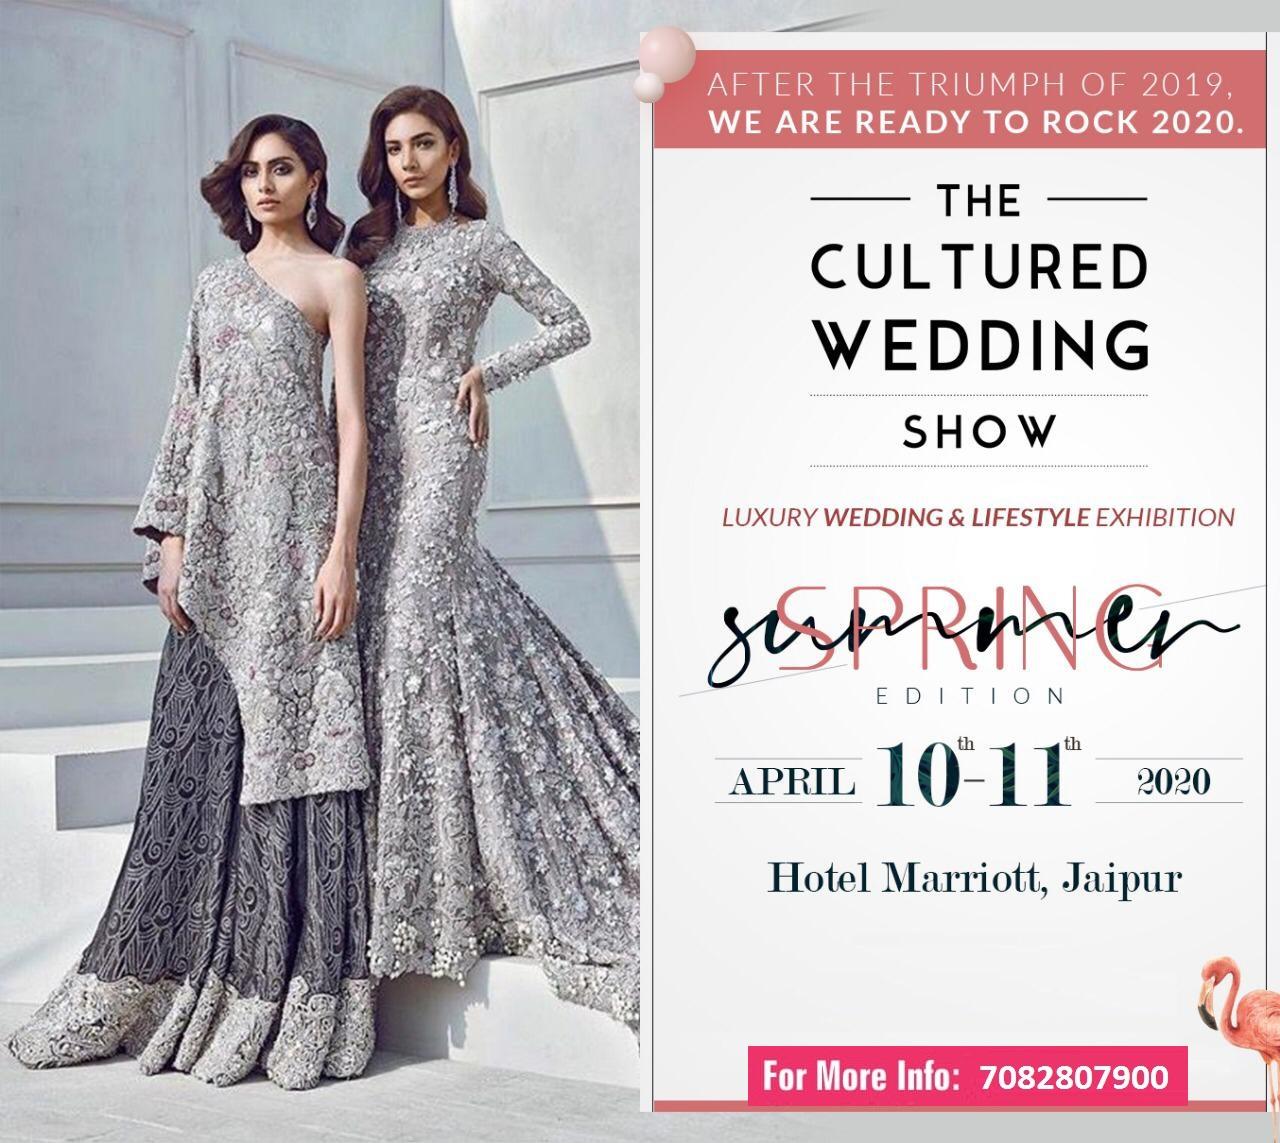 The Cultured Wedding Show EventsGram india, Jaipur, Rajasthan, India